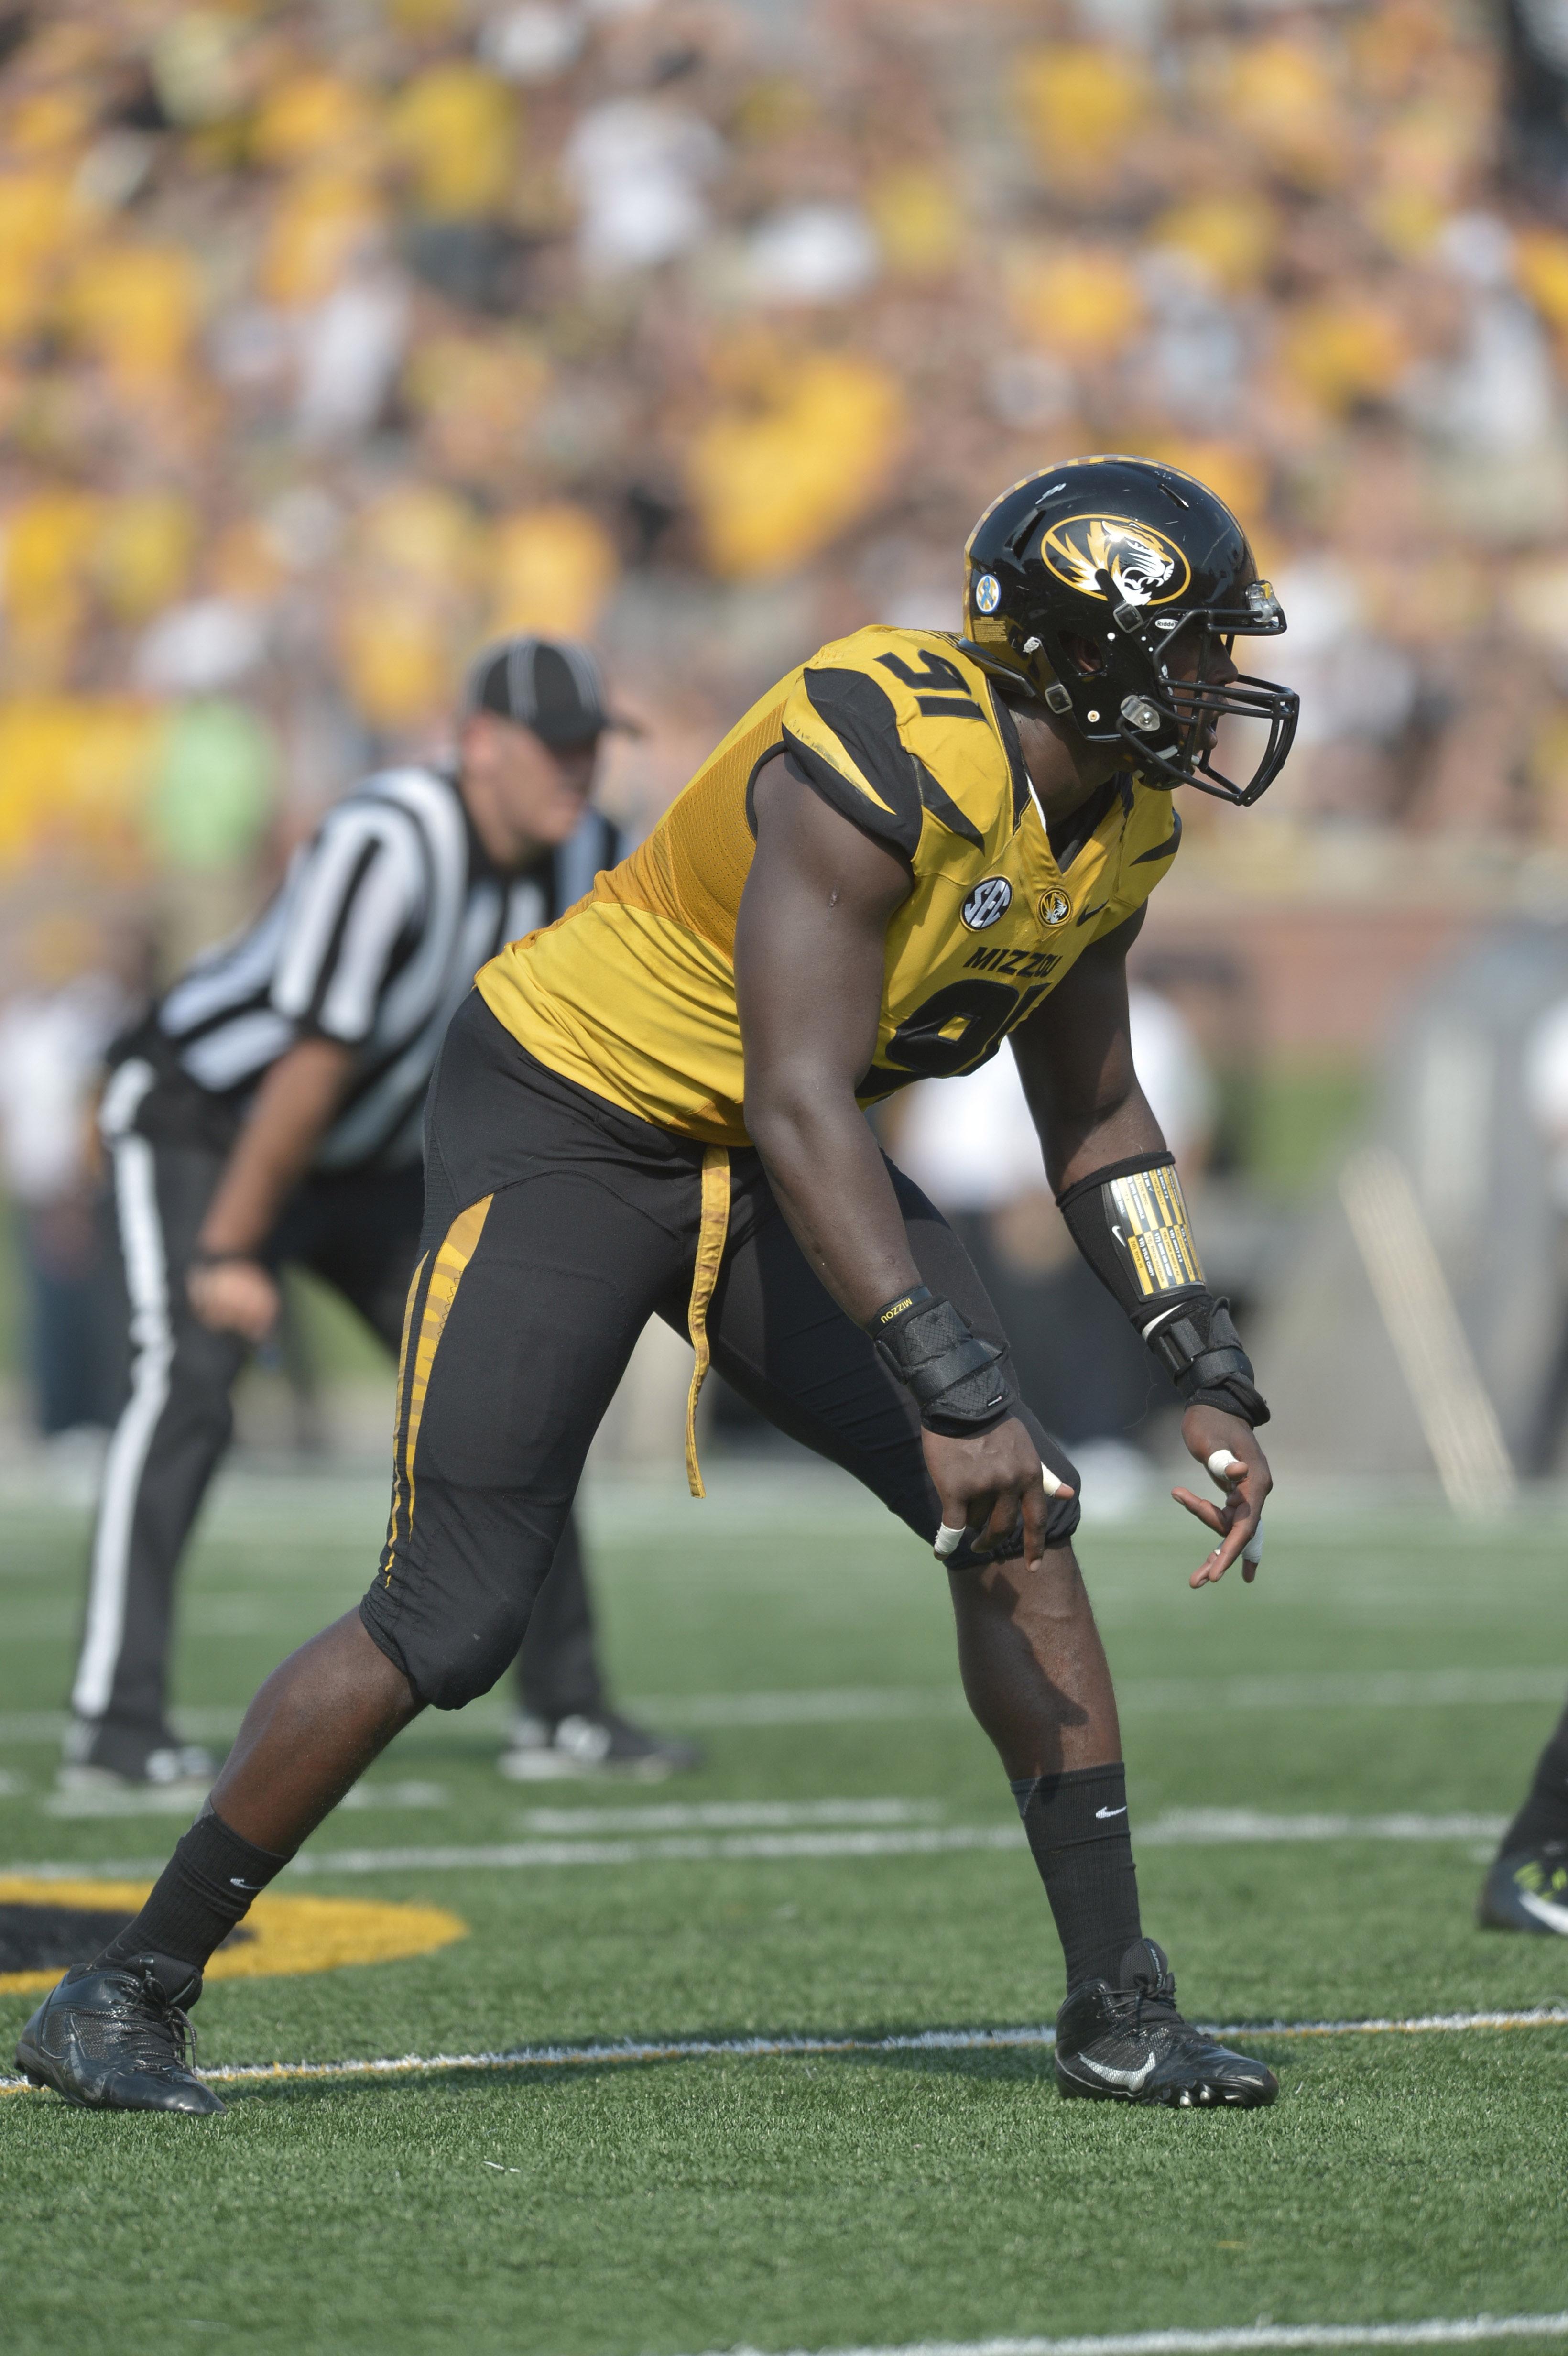 NFL Combine 2013 Primer: The Position-Specific Drills, Defensive Edition - Blogging The Boys